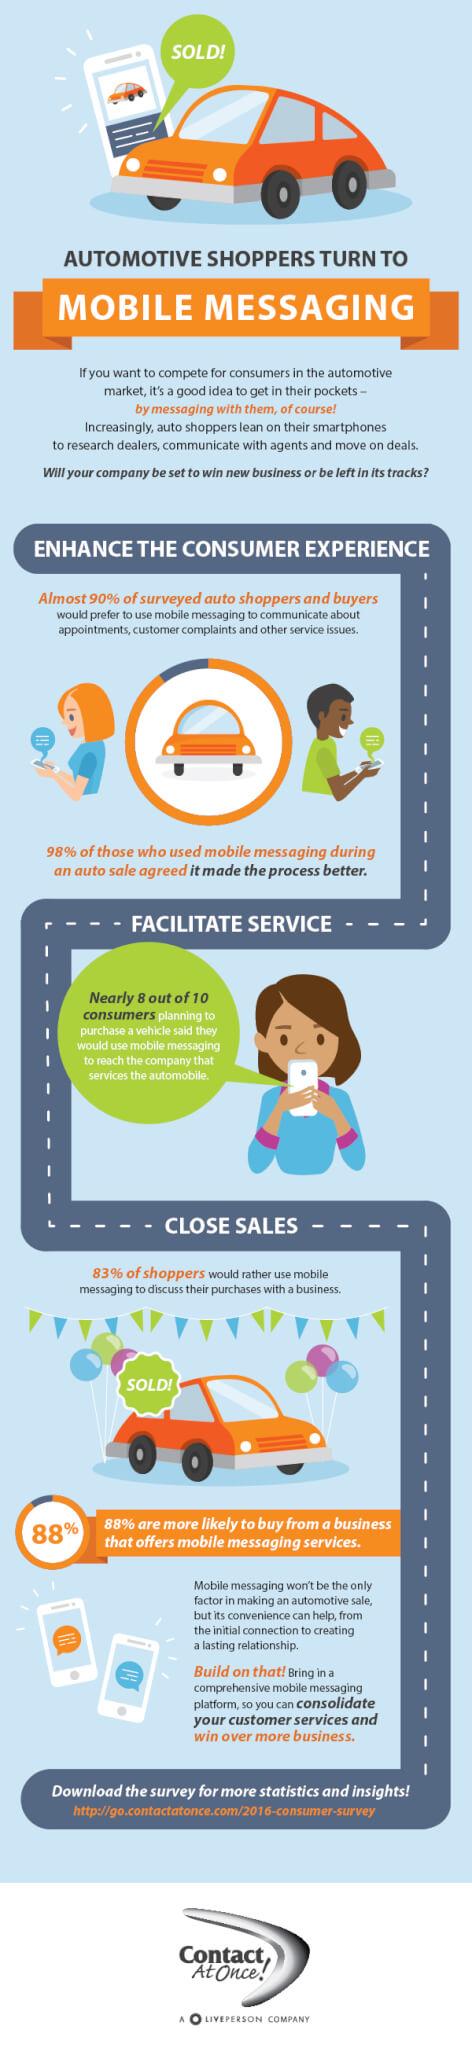 2016 Consumer Survey Infographic for Automotive Dealerships